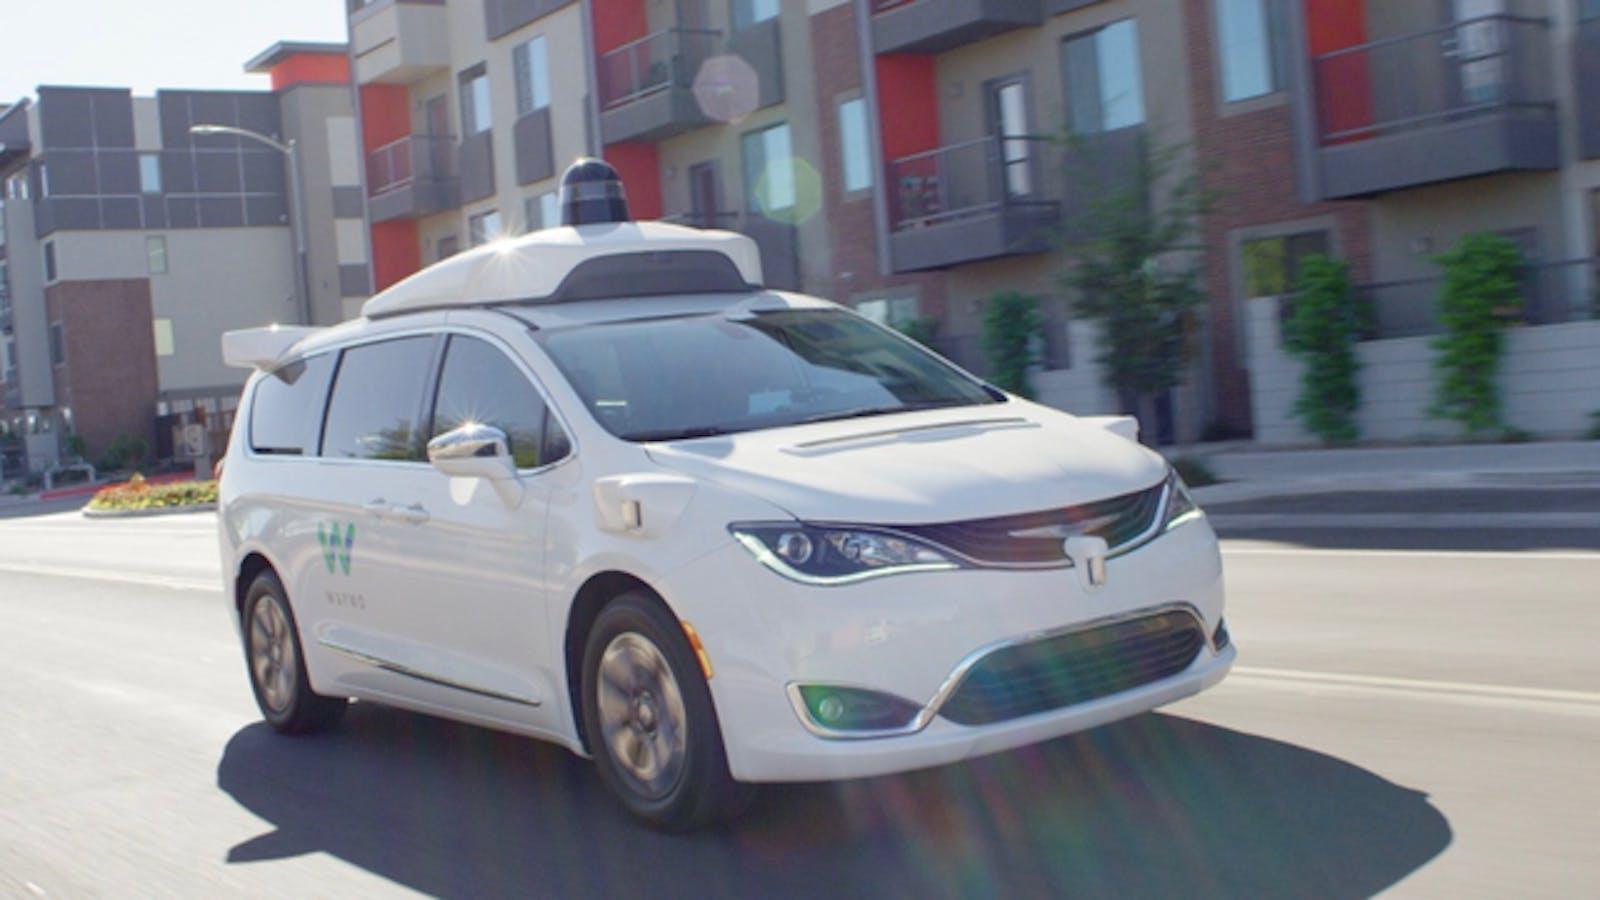 A Waymo self-driving test vehicle in the Phoenix area. Photo: Waymo.